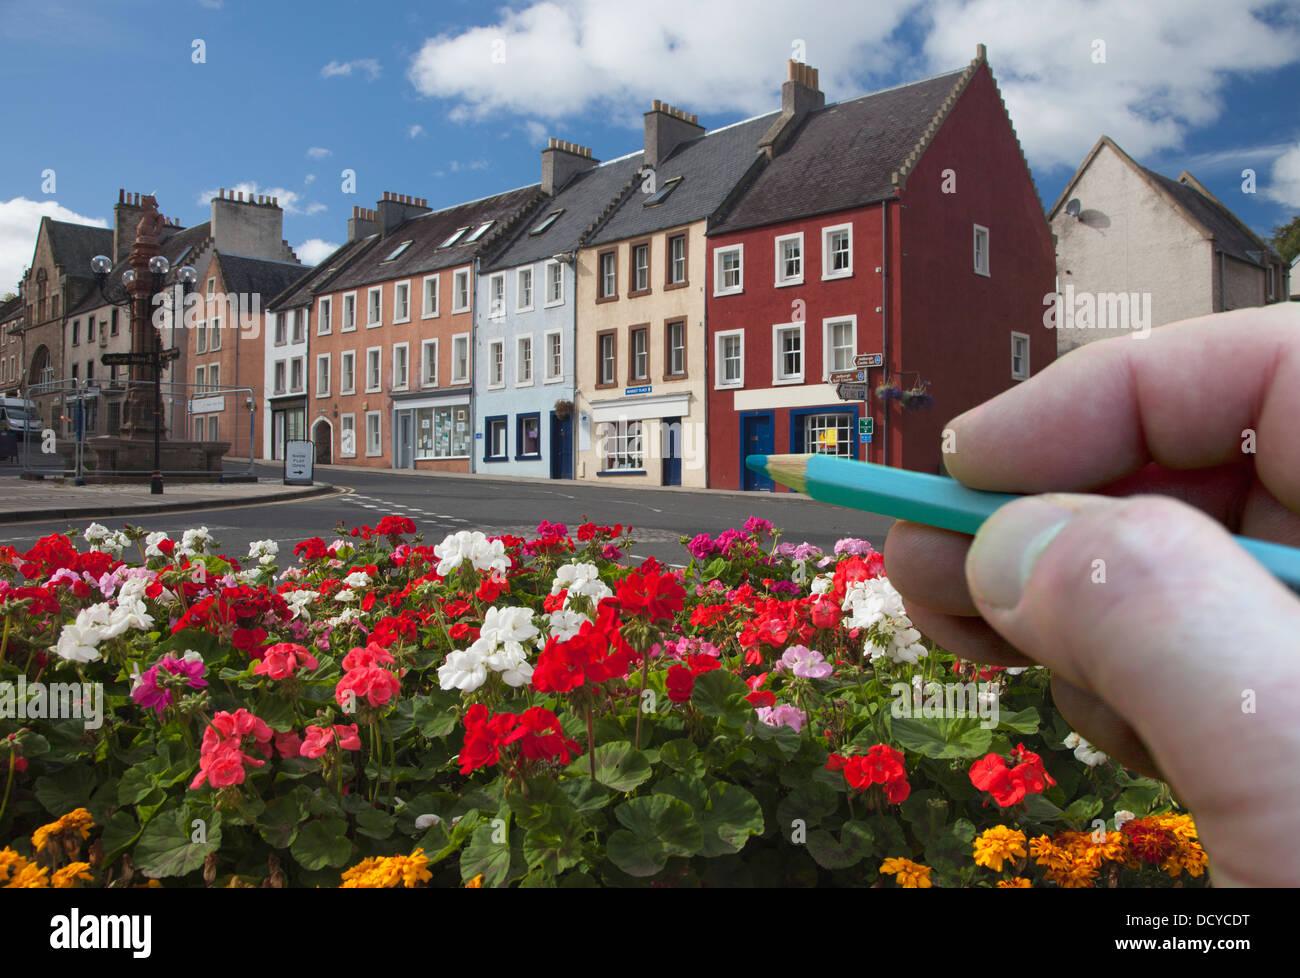 Digitally Enhanced Image Of Hand Holding Pencil Against Town; Jedburgh, Scottish Borders, Scotland - Stock Image